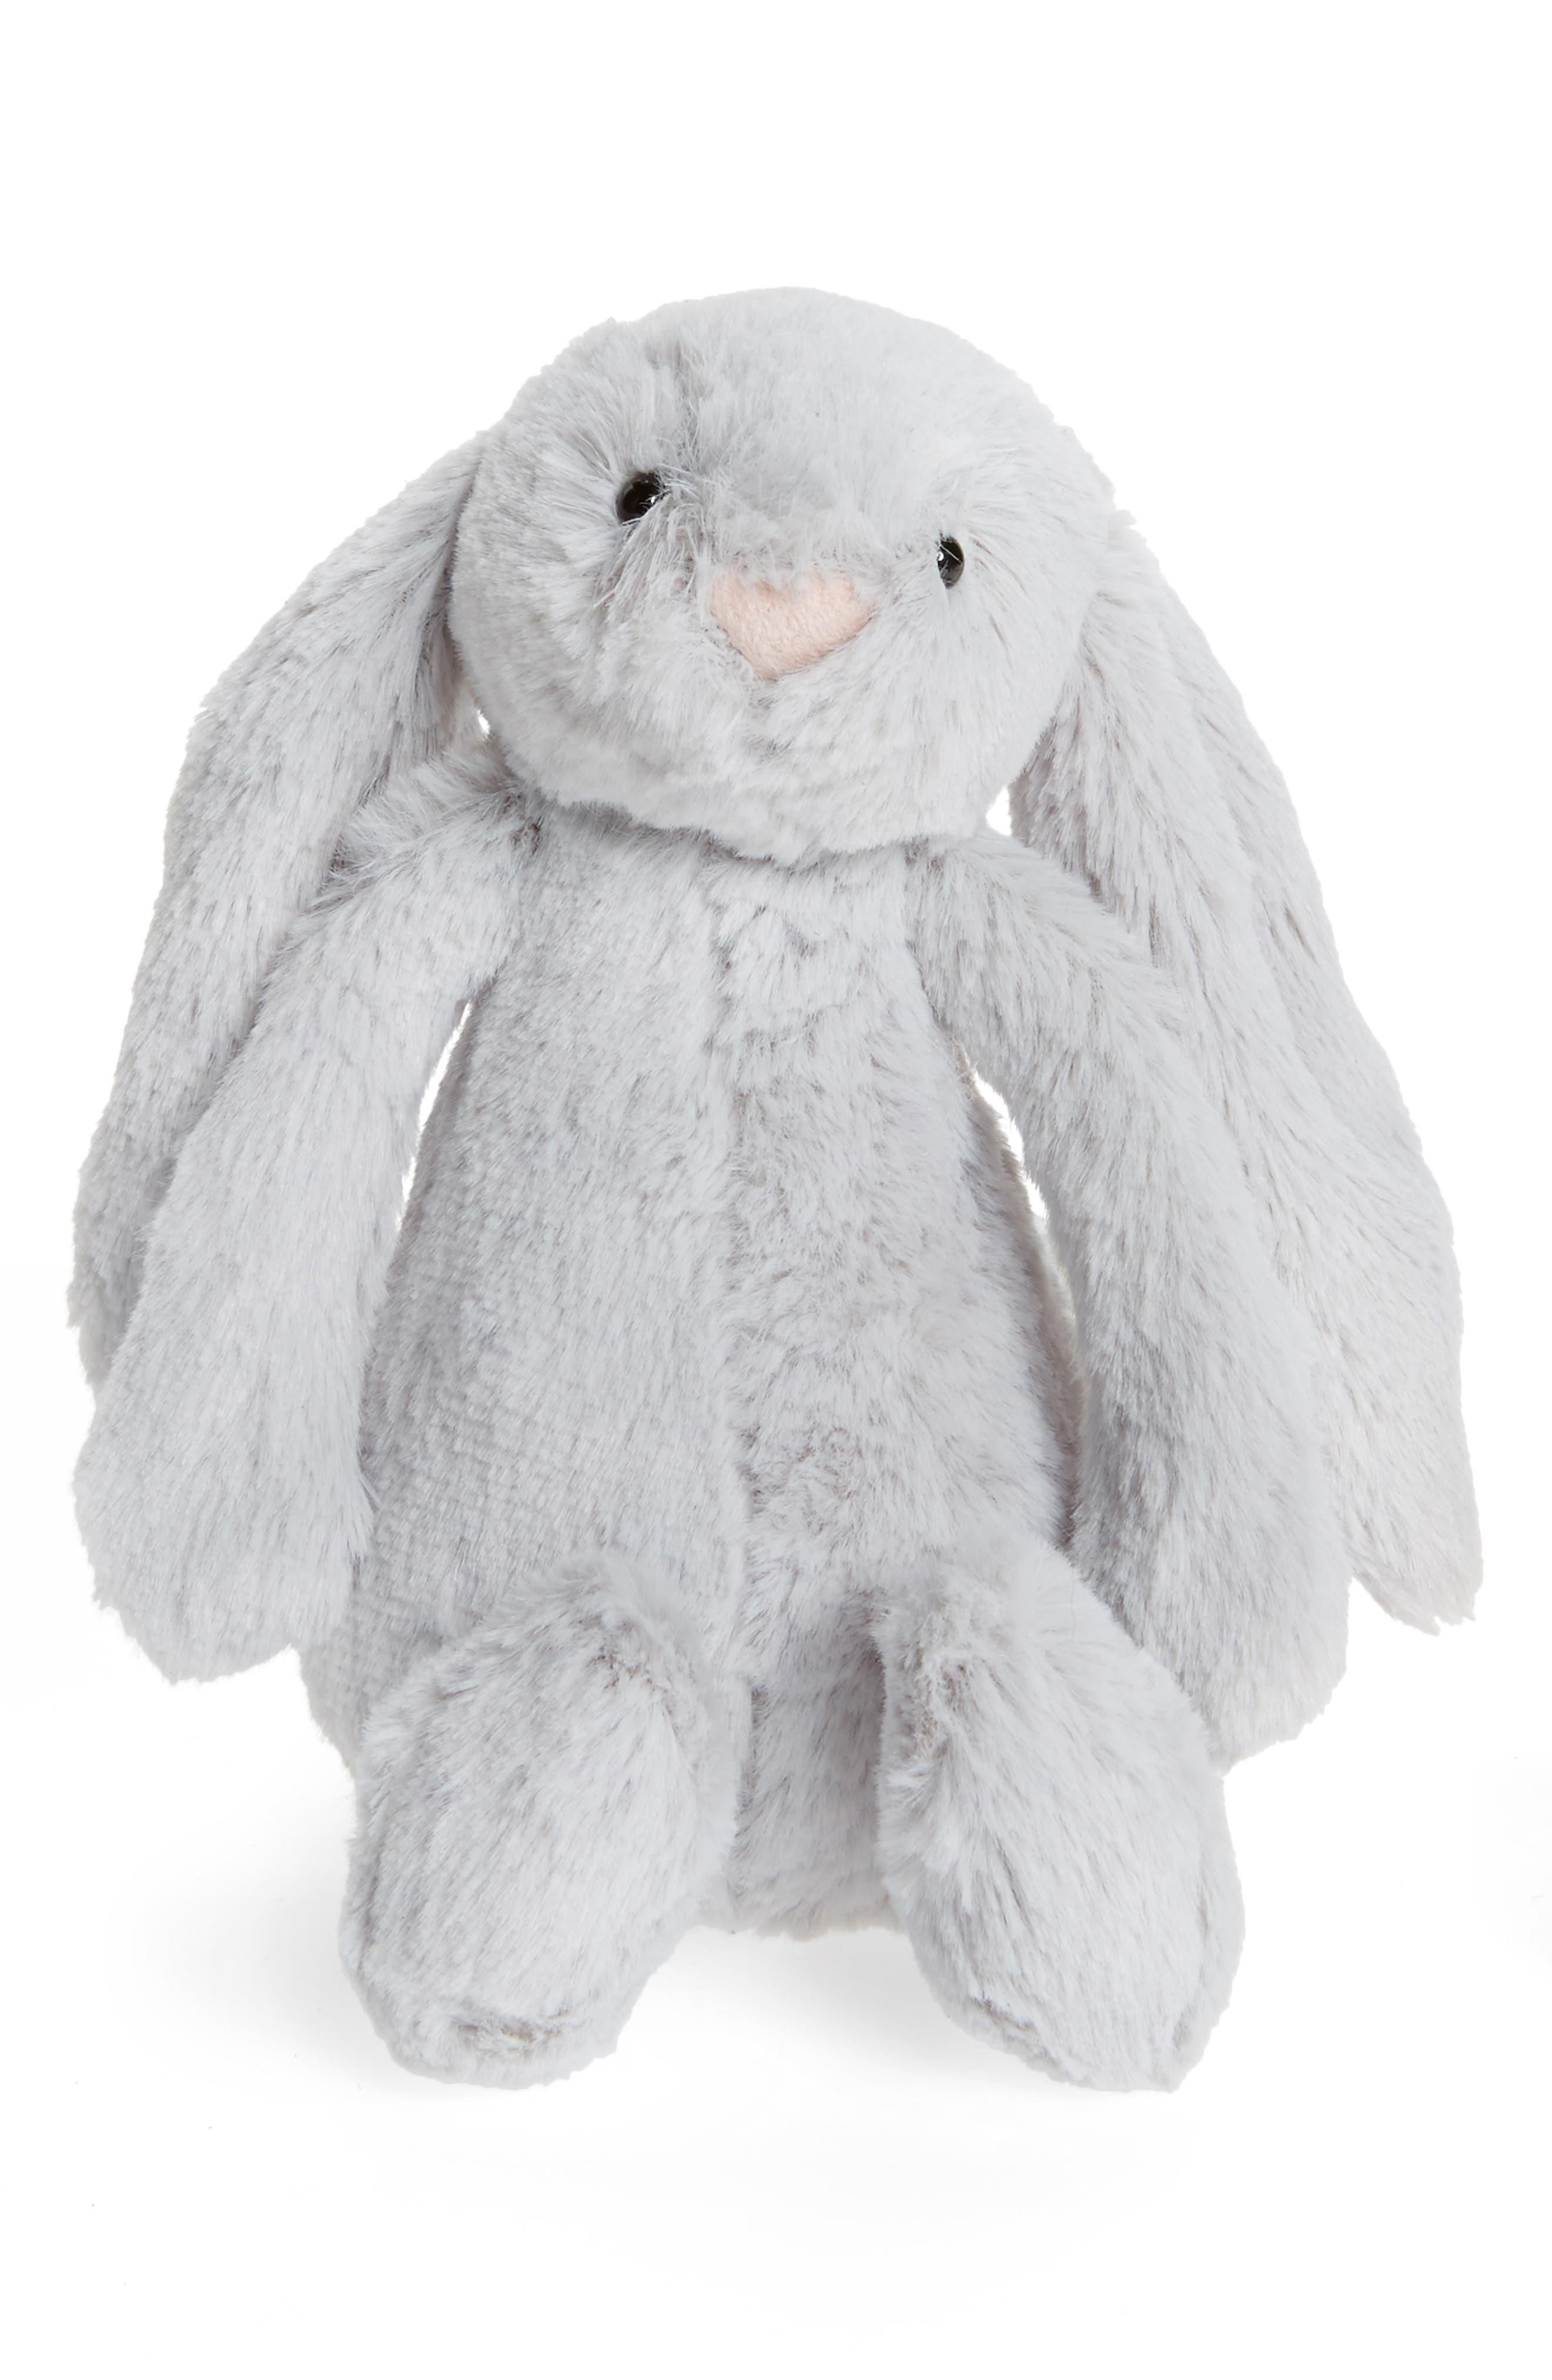 JELLYCAT,                             'Small Bashful Bunny' Stuffed Animal,                             Main thumbnail 1, color,                             GREY